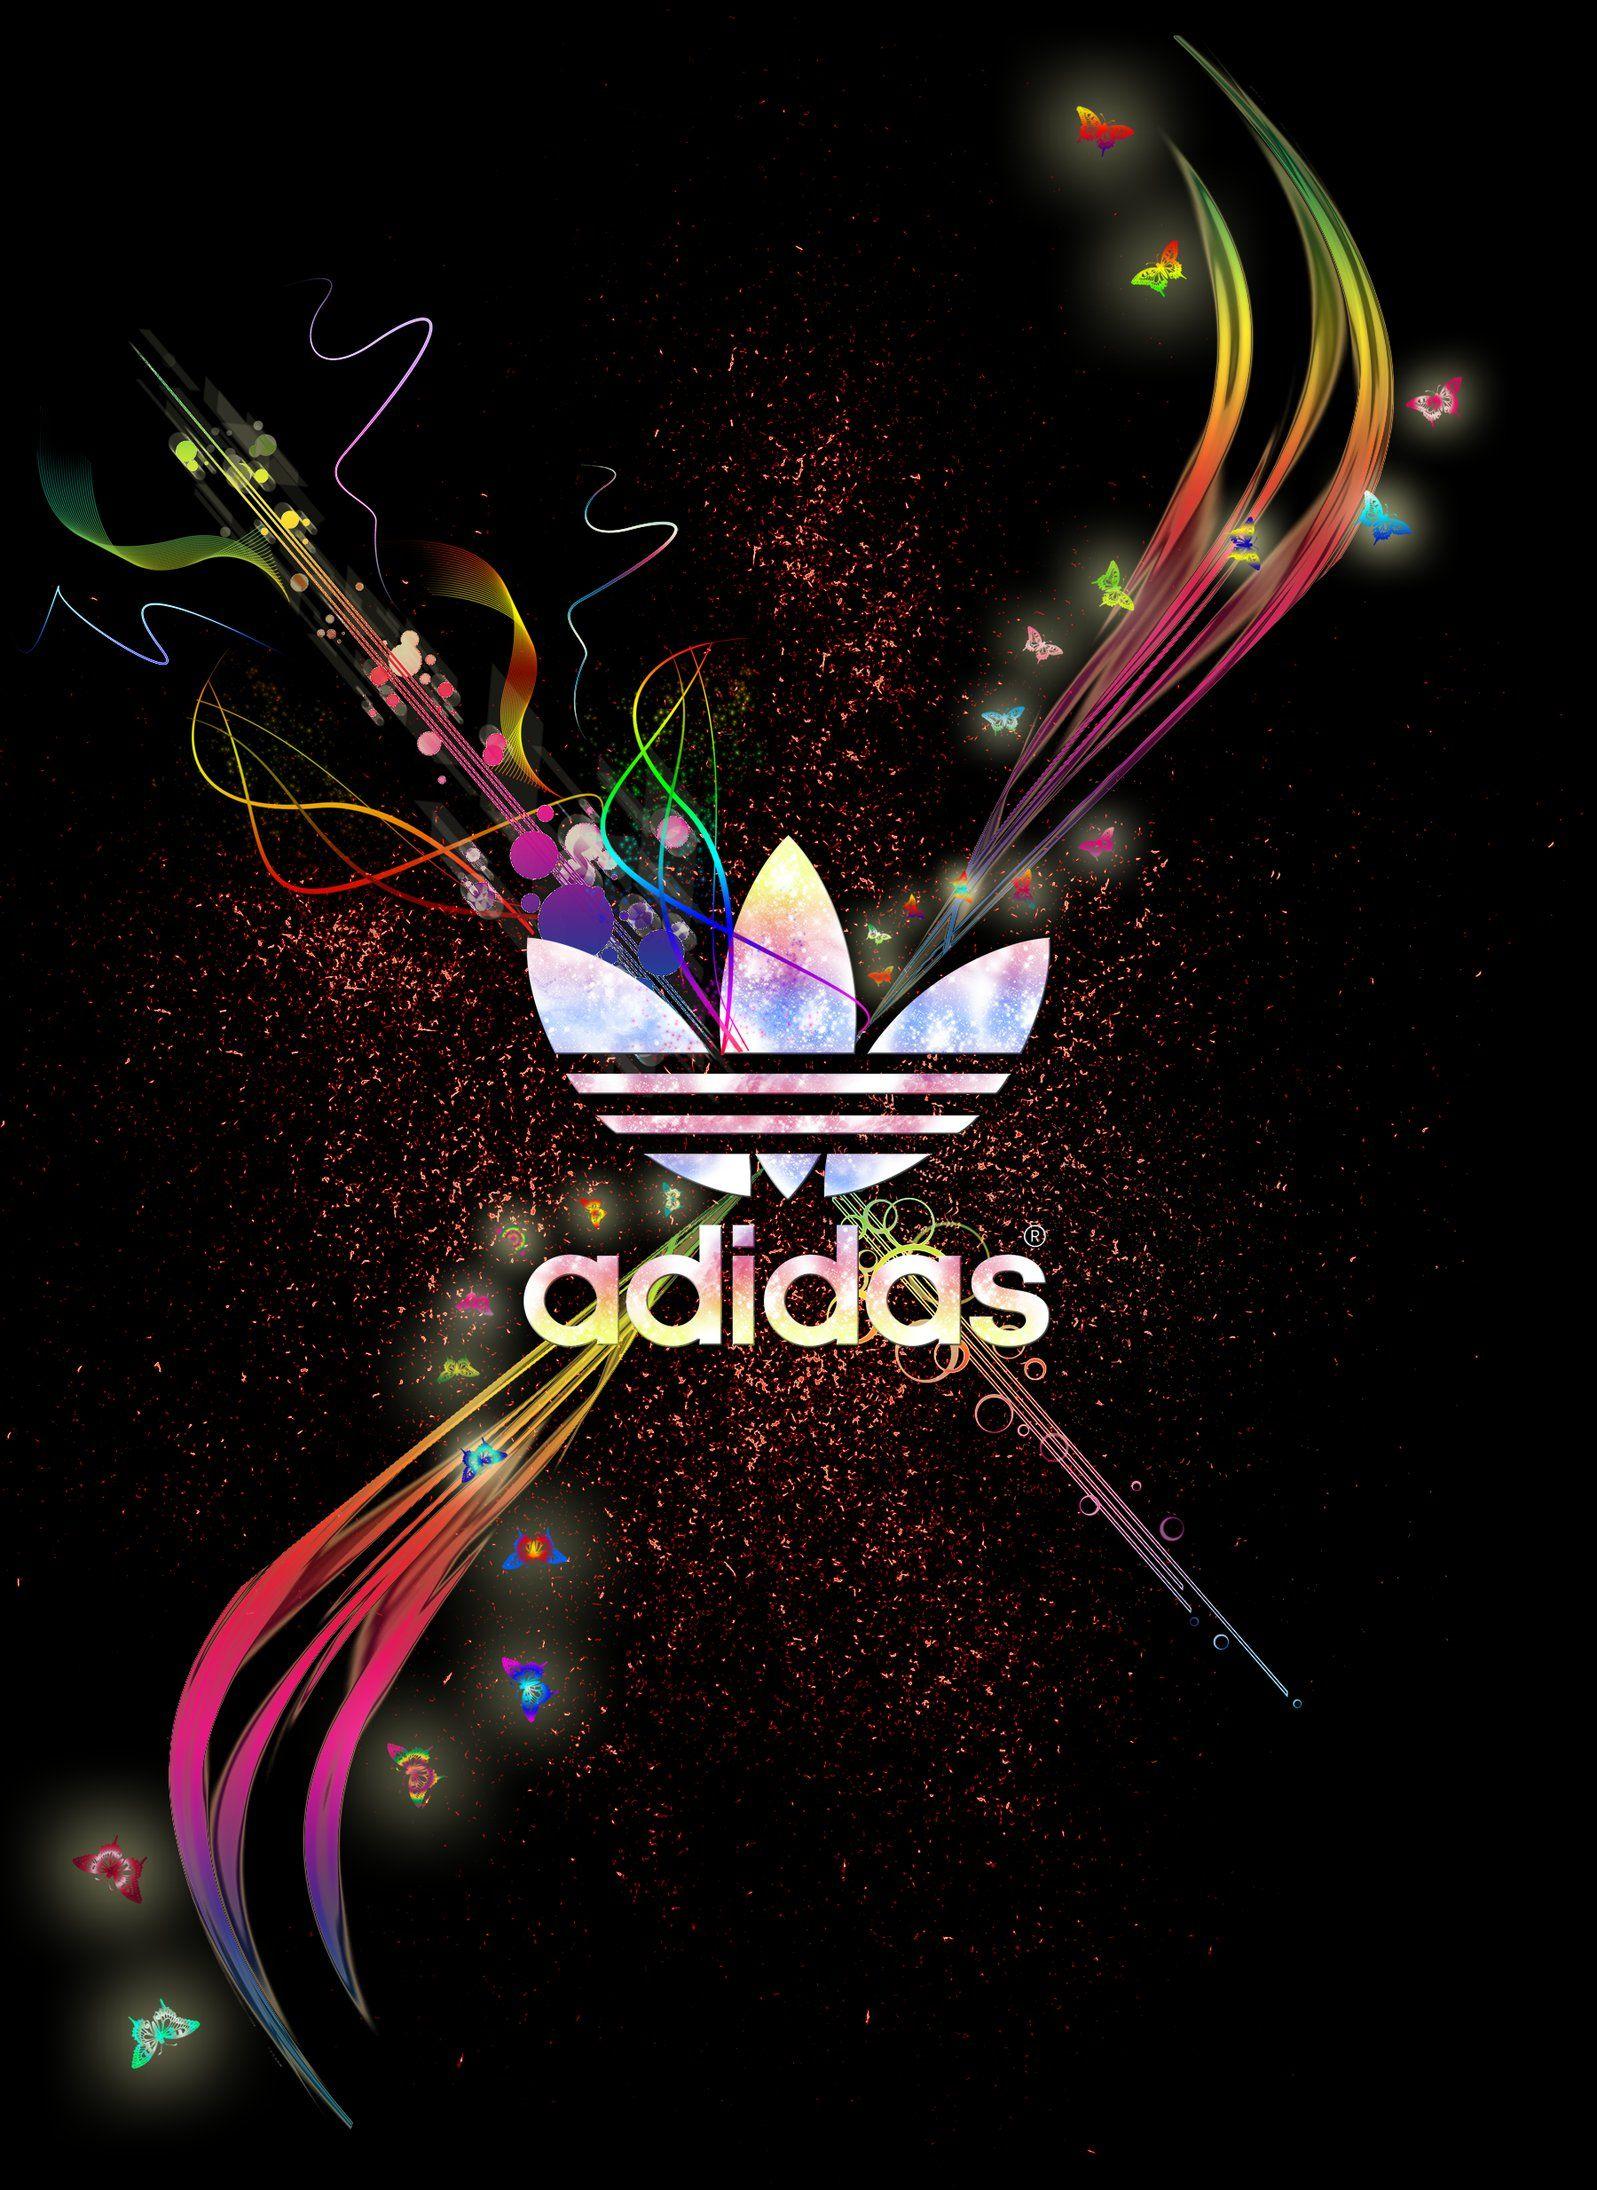 Adidas | fd adidas | Hd wallpaper iphone, Iphone wallpaper ...